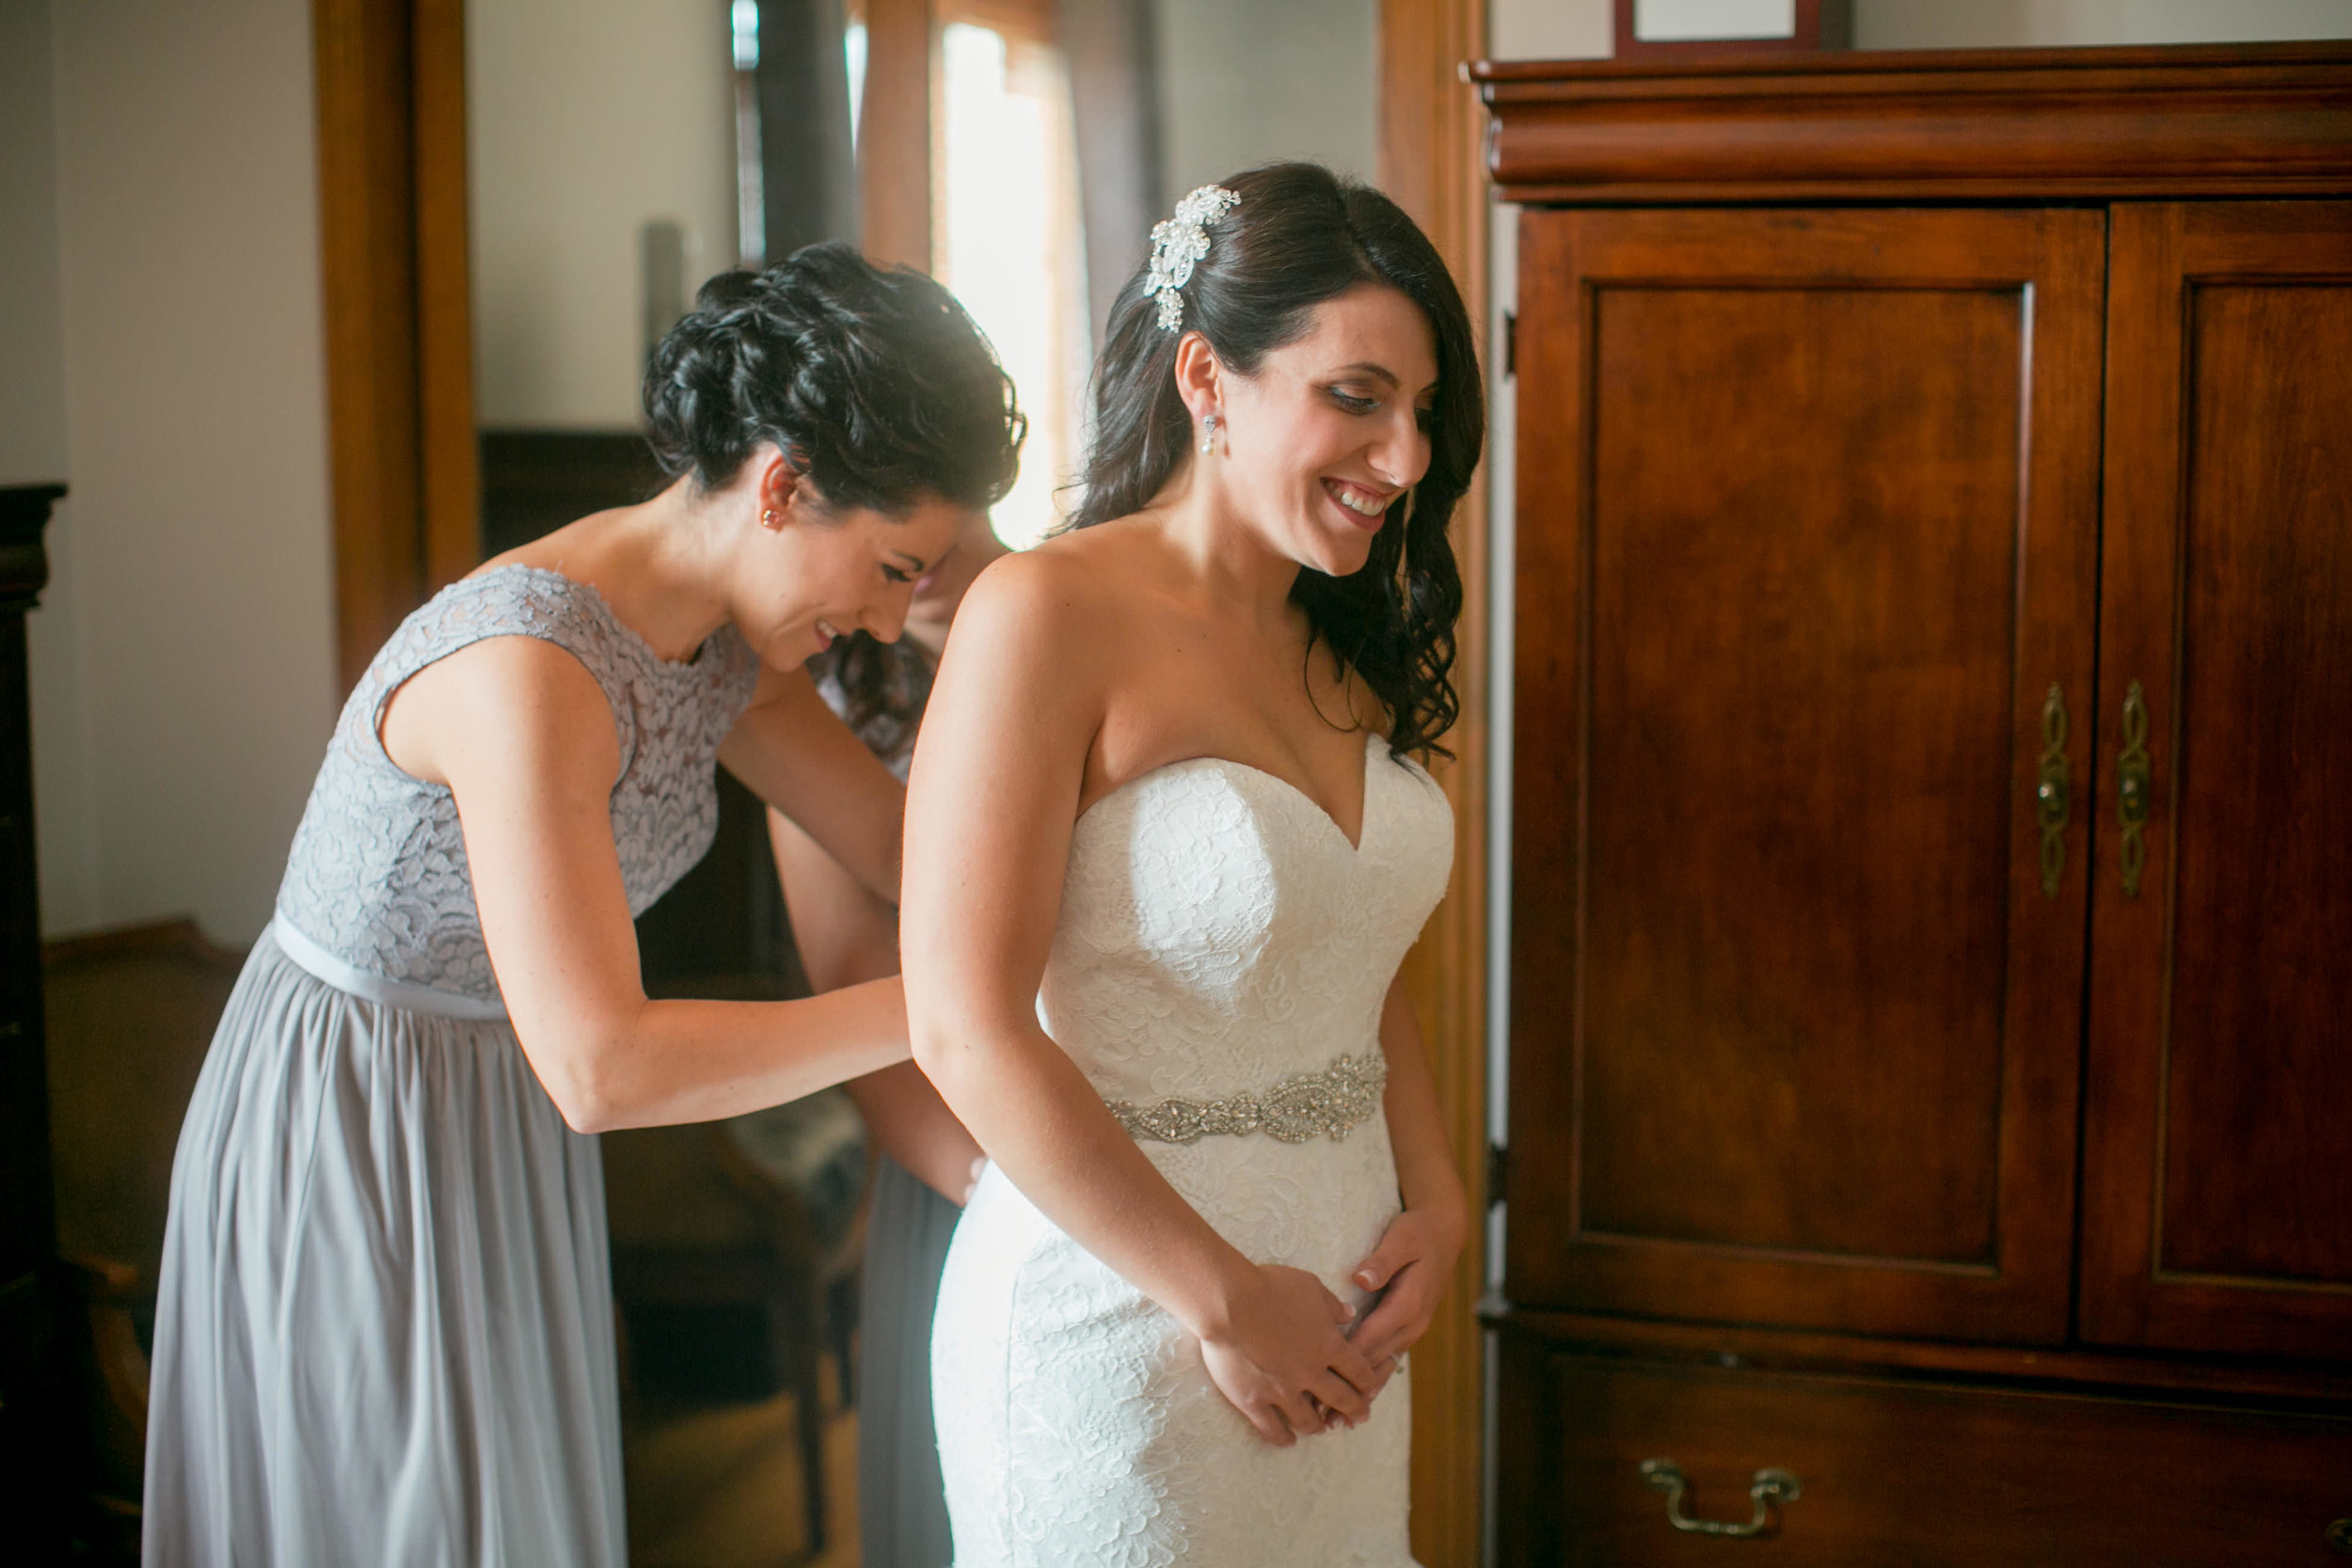 Stefanie___Bernard___Daniel_Ricci_Weddings_High_Res._Finals__066.jpg